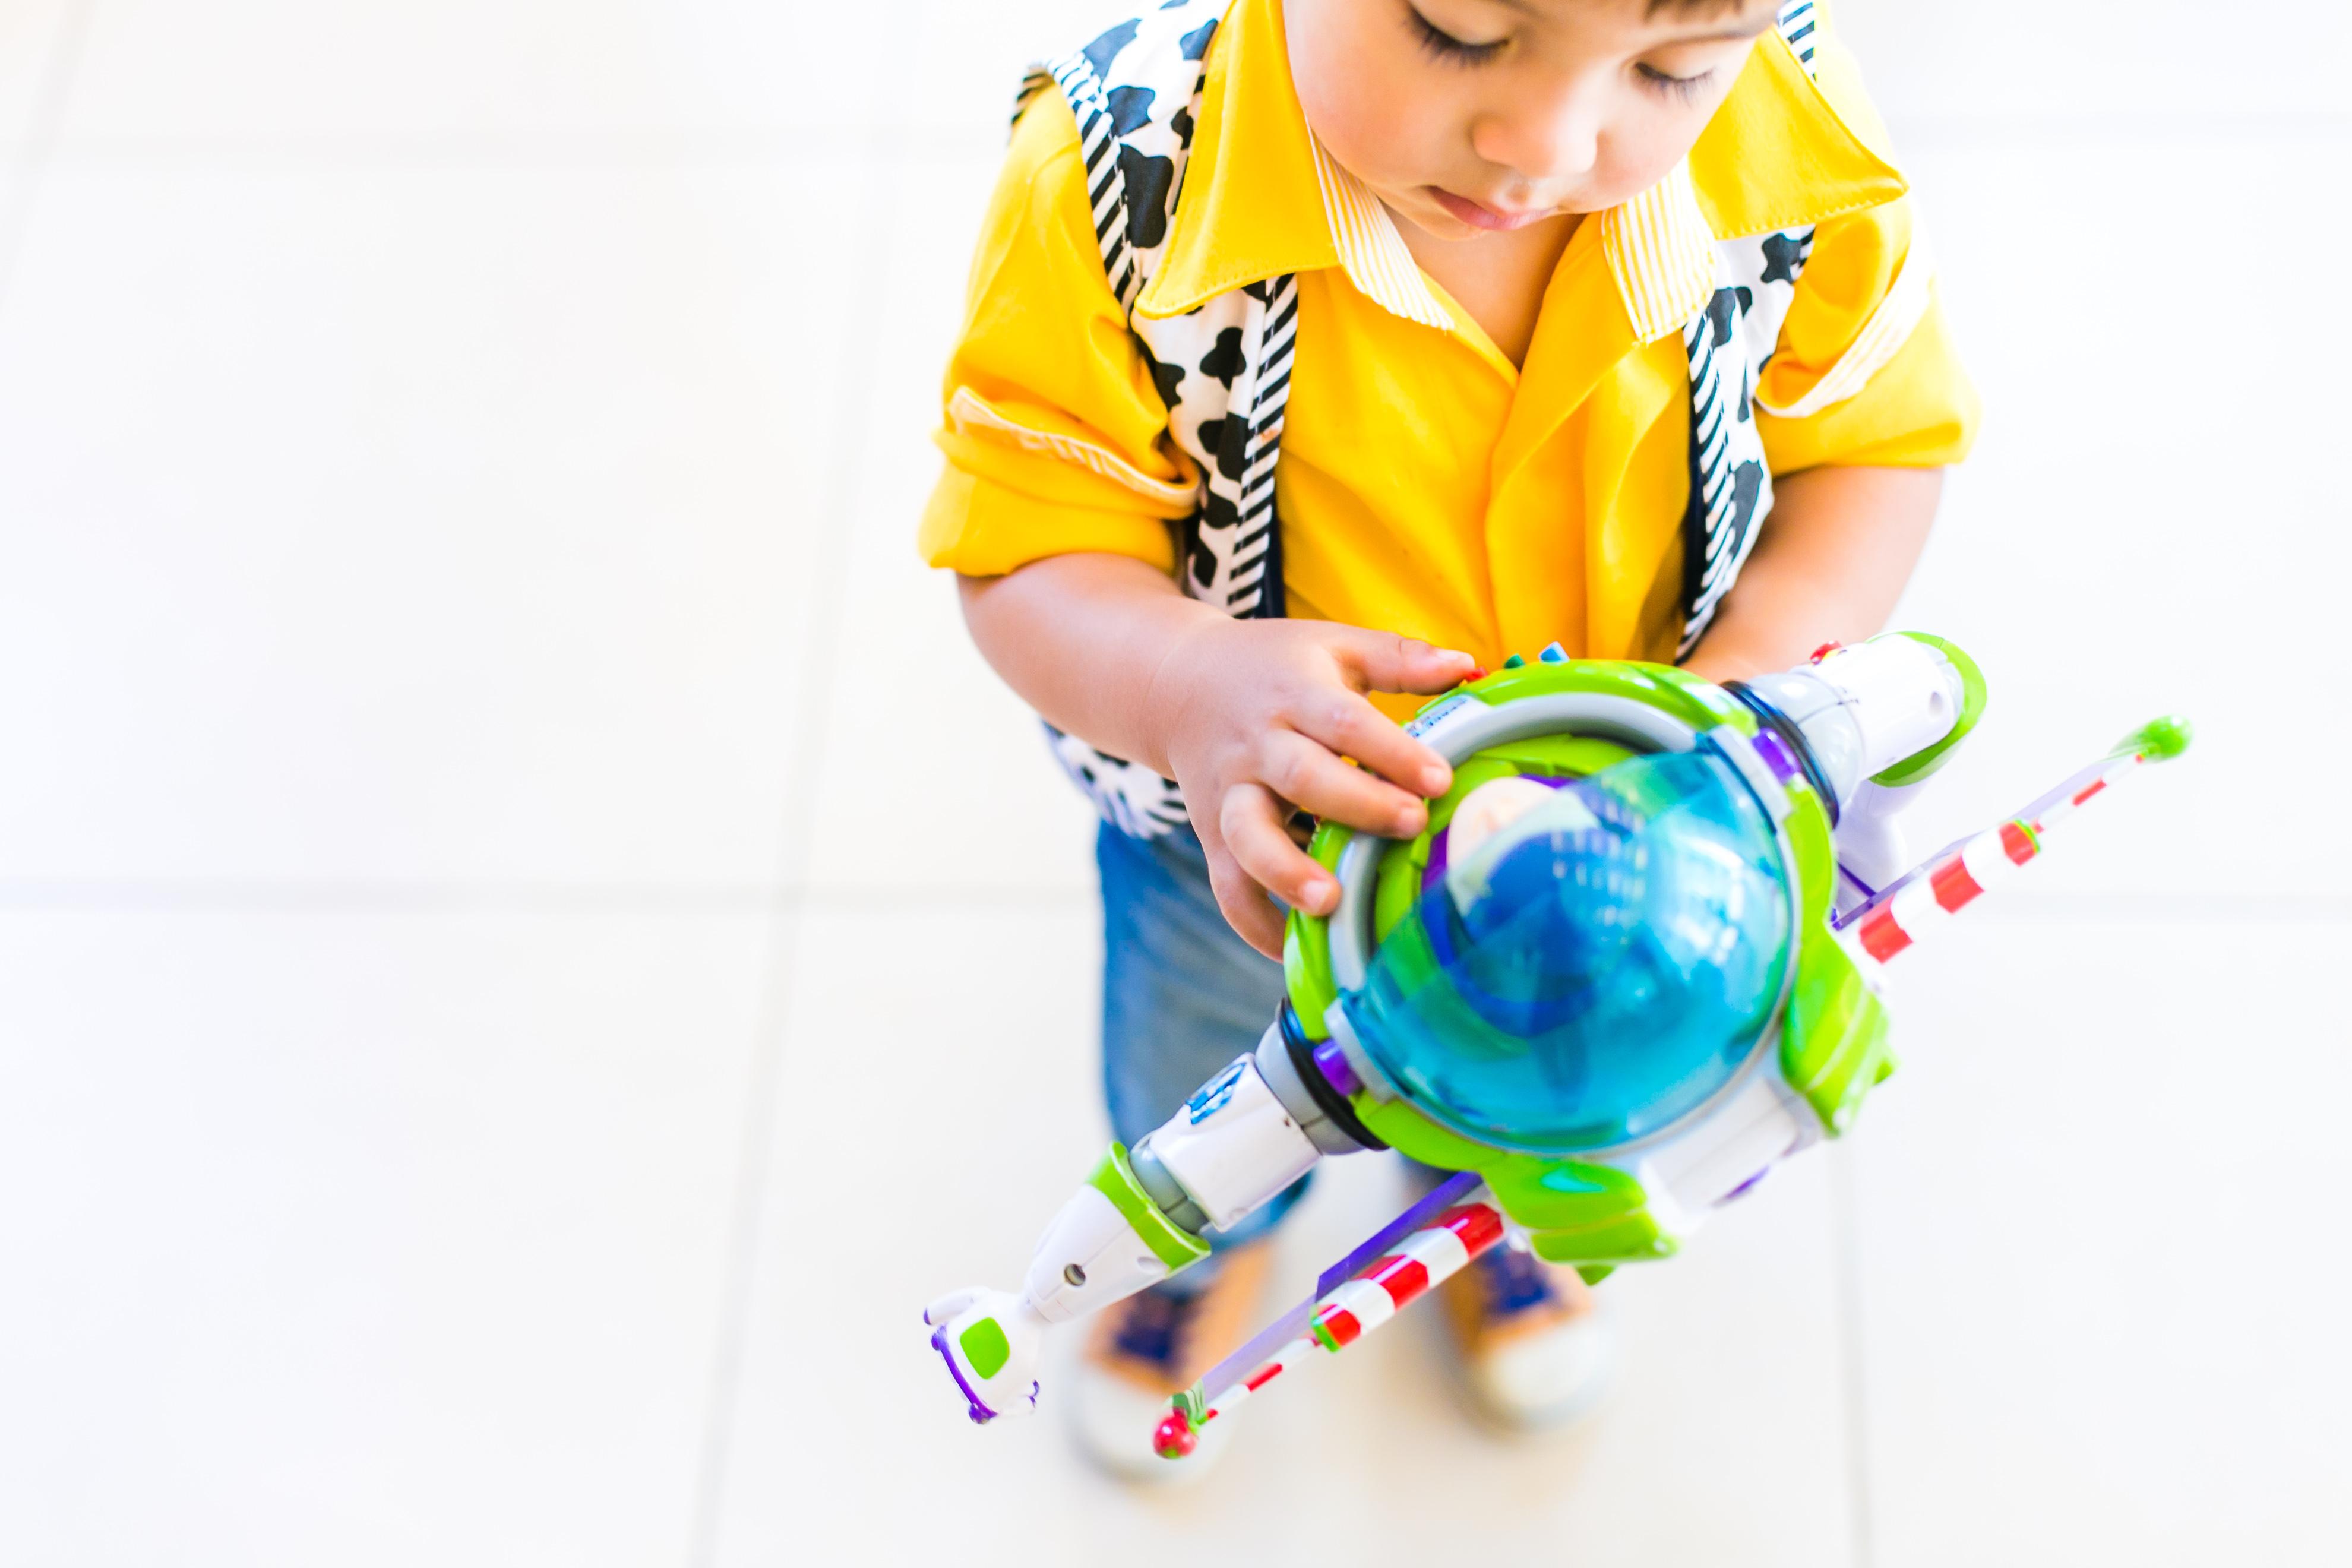 ritaruiz-fotografia-festa-toystory